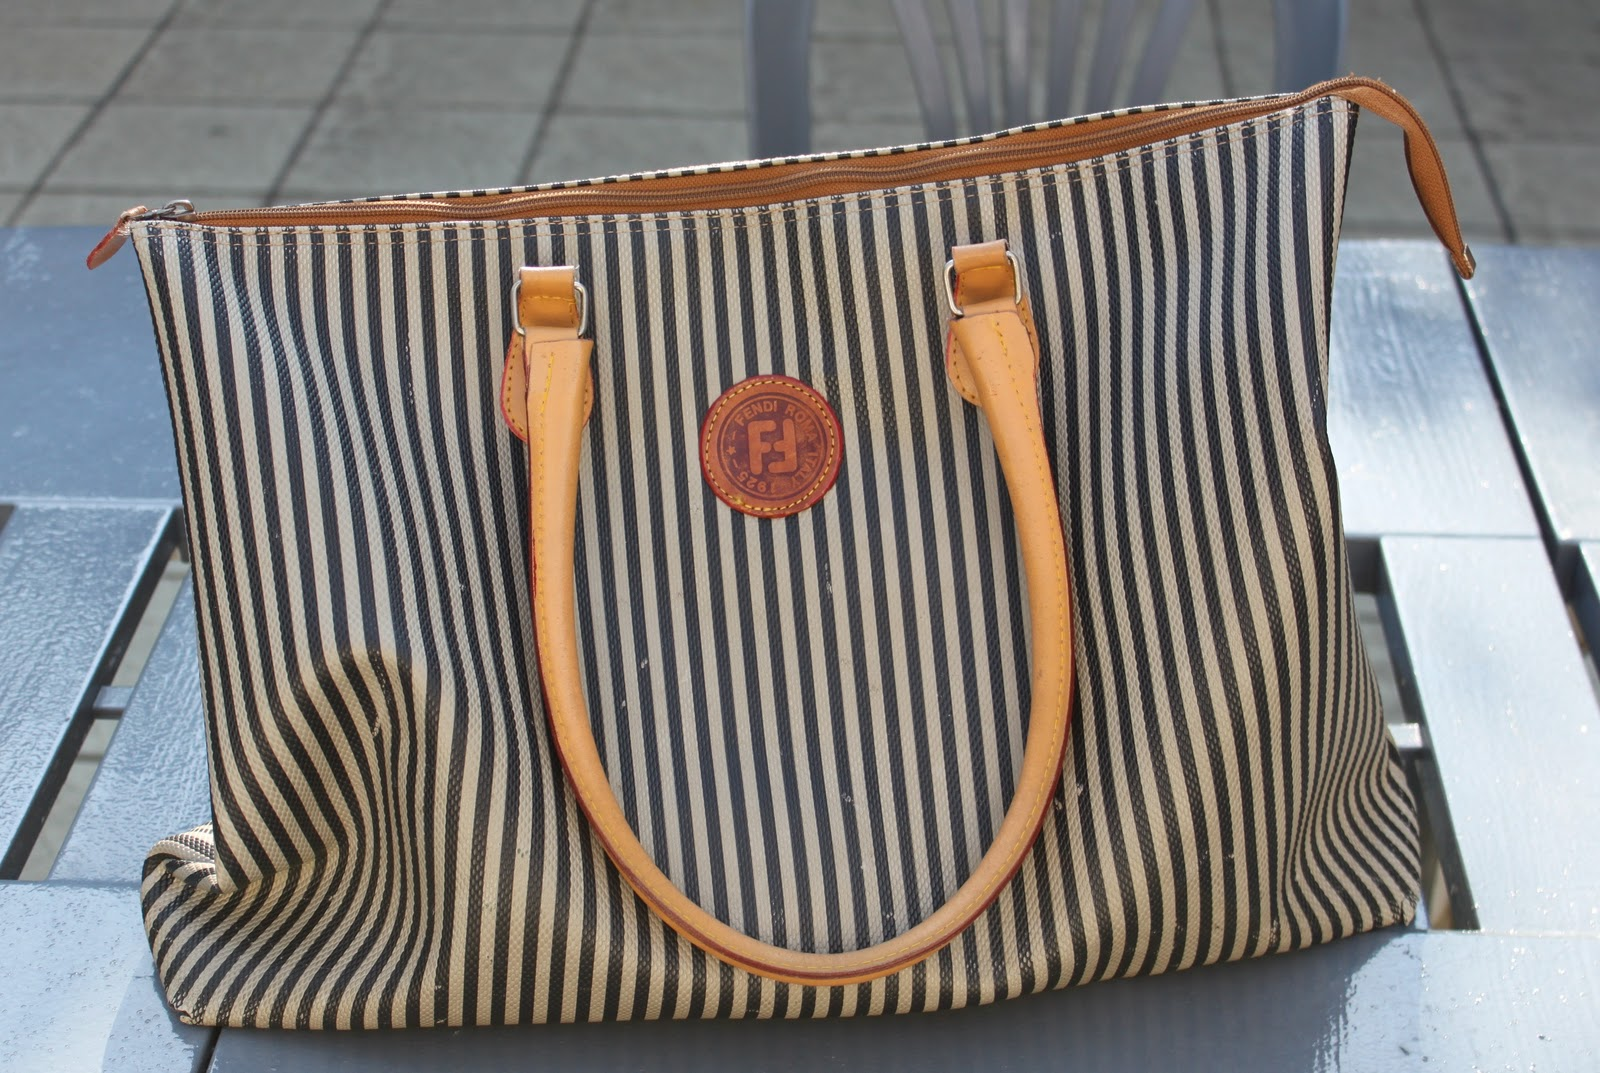 http://2.bp.blogspot.com/-SgllLvesfvQ/TnNn8fKjjfI/AAAAAAAABJM/uJy_l2PP4Xg/s1600/Vintage+Fendi+bag.JPG